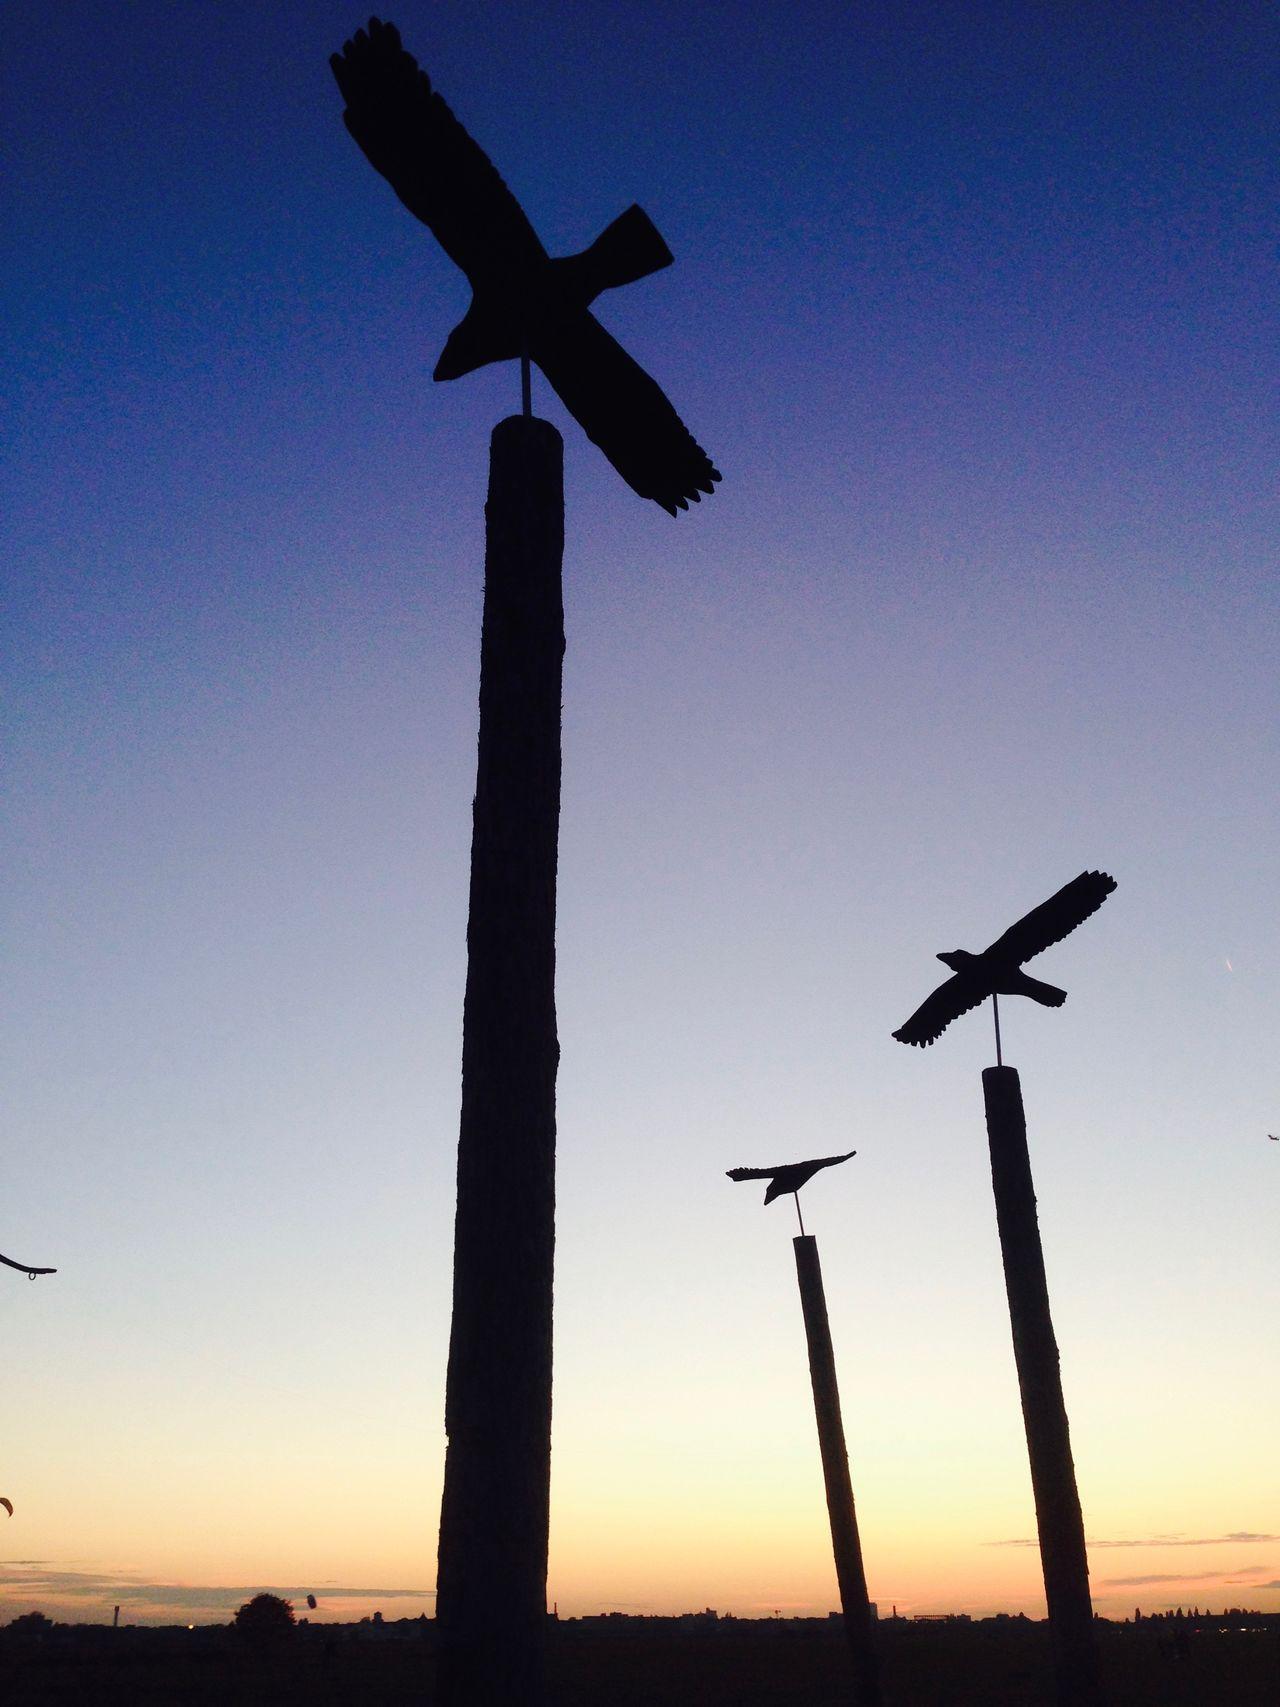 Berlin Day Nature No People Outdoors Silhouette Sky Sunset Tempelhofer Feld